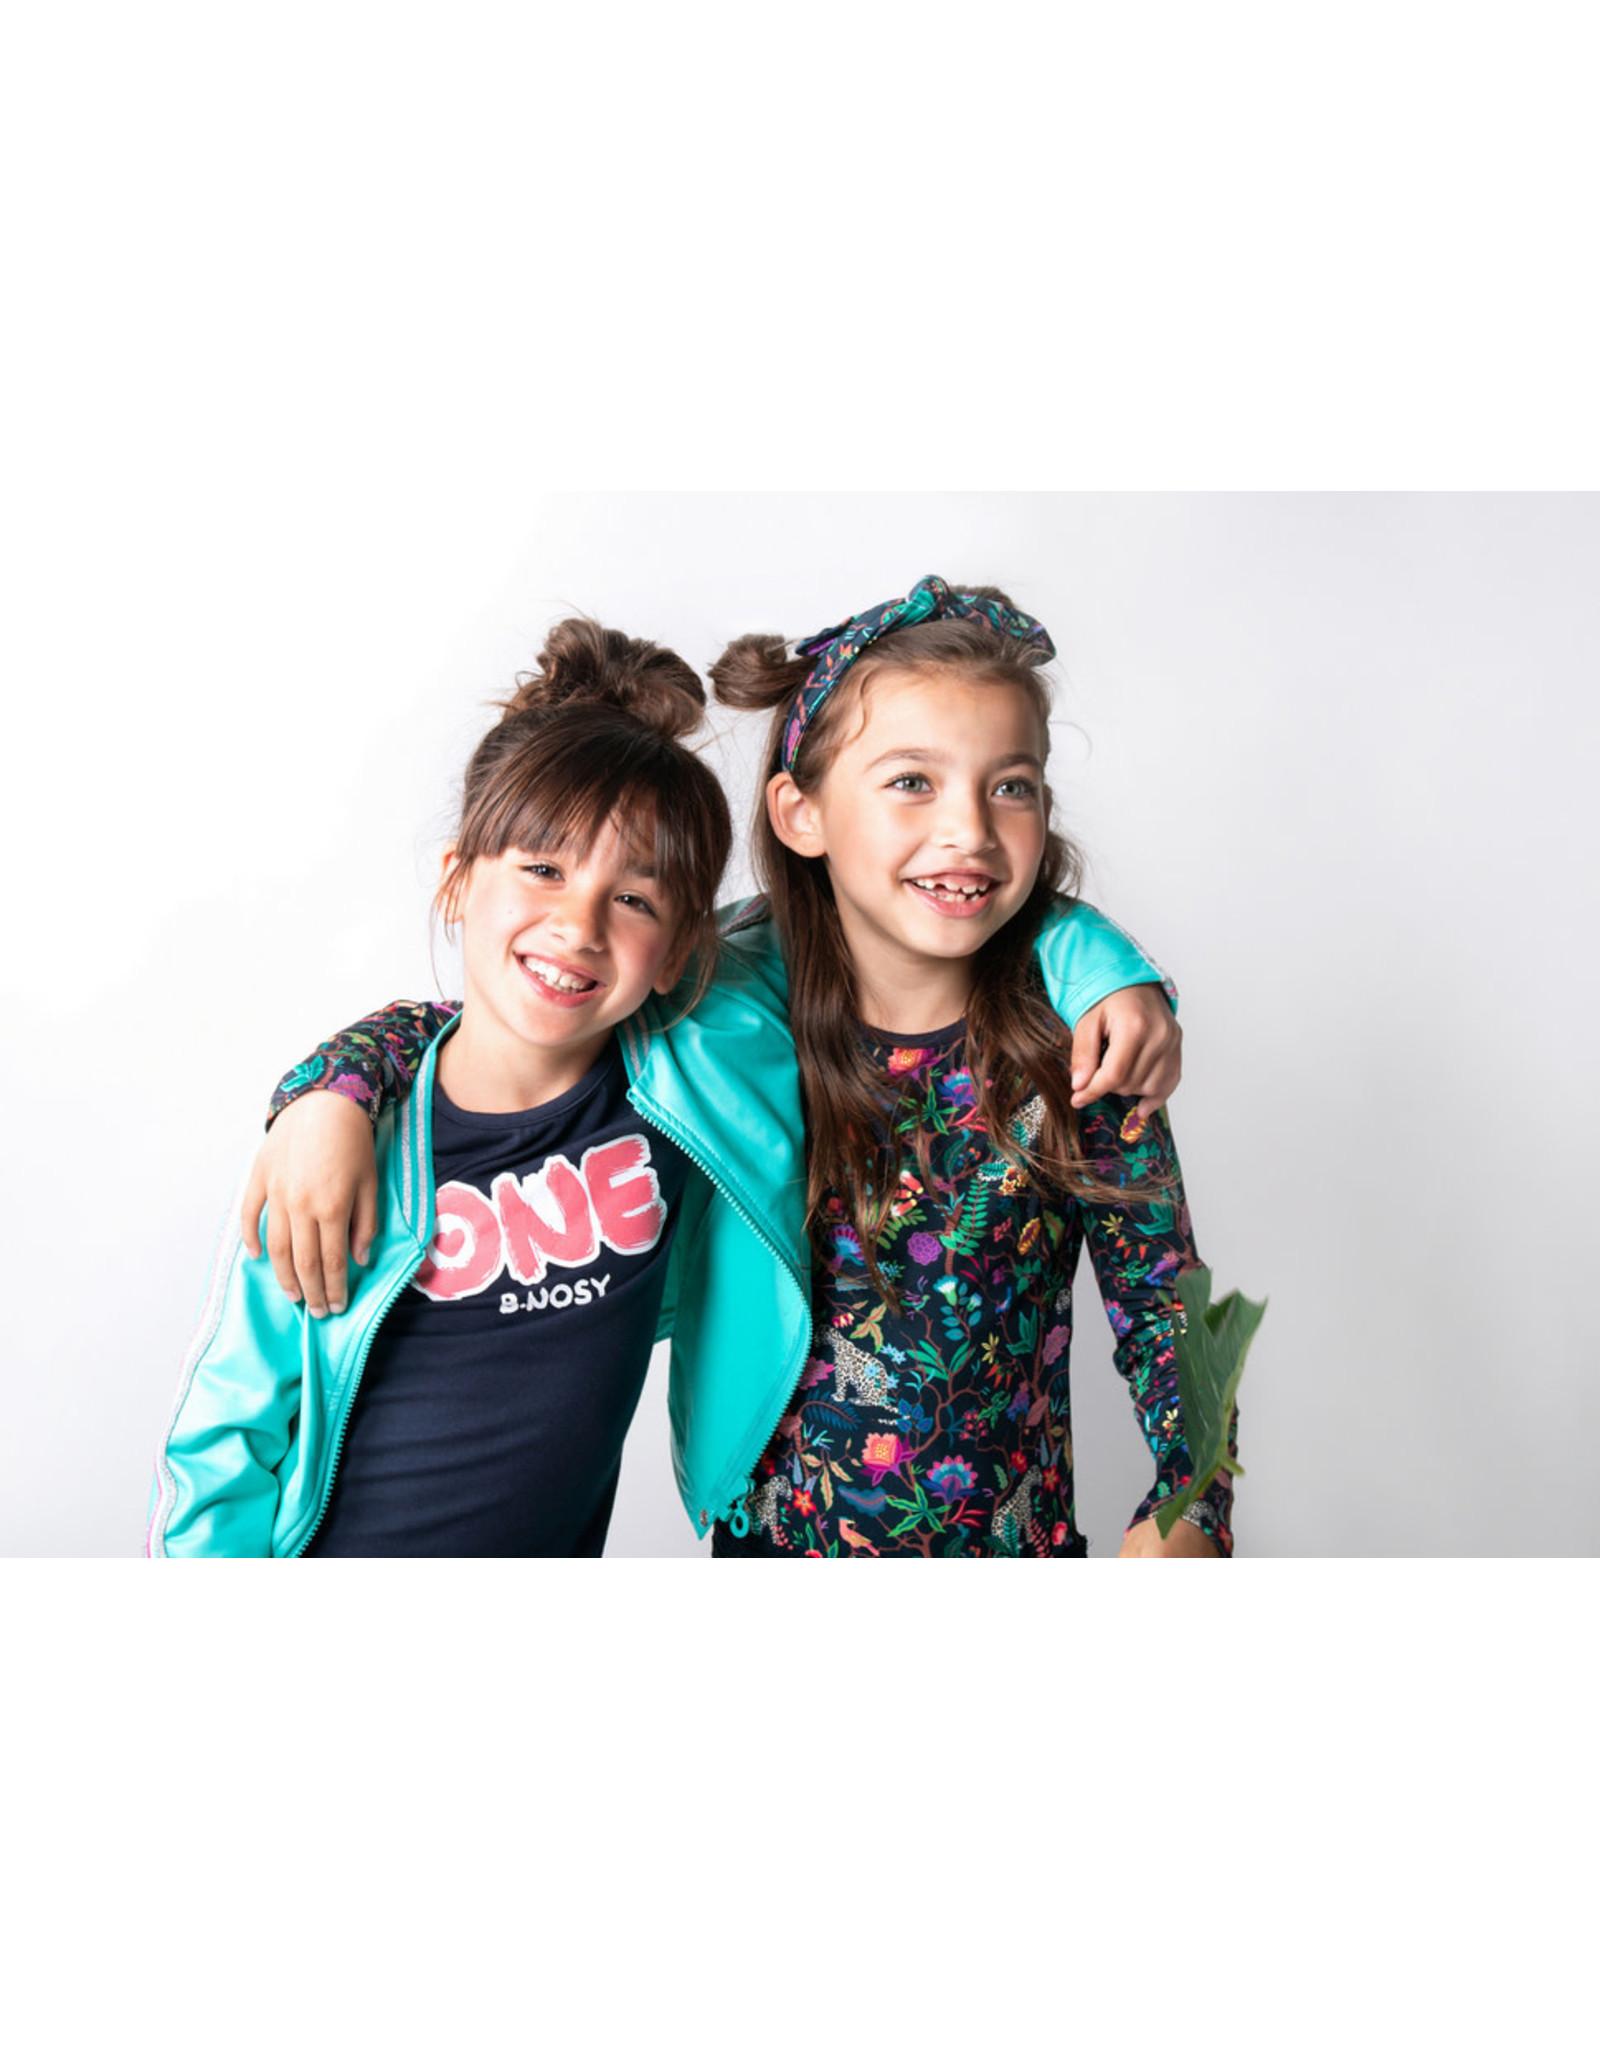 B.Nosy B.Nosy meisjes t-shirt met glitter strepen op de acherkant